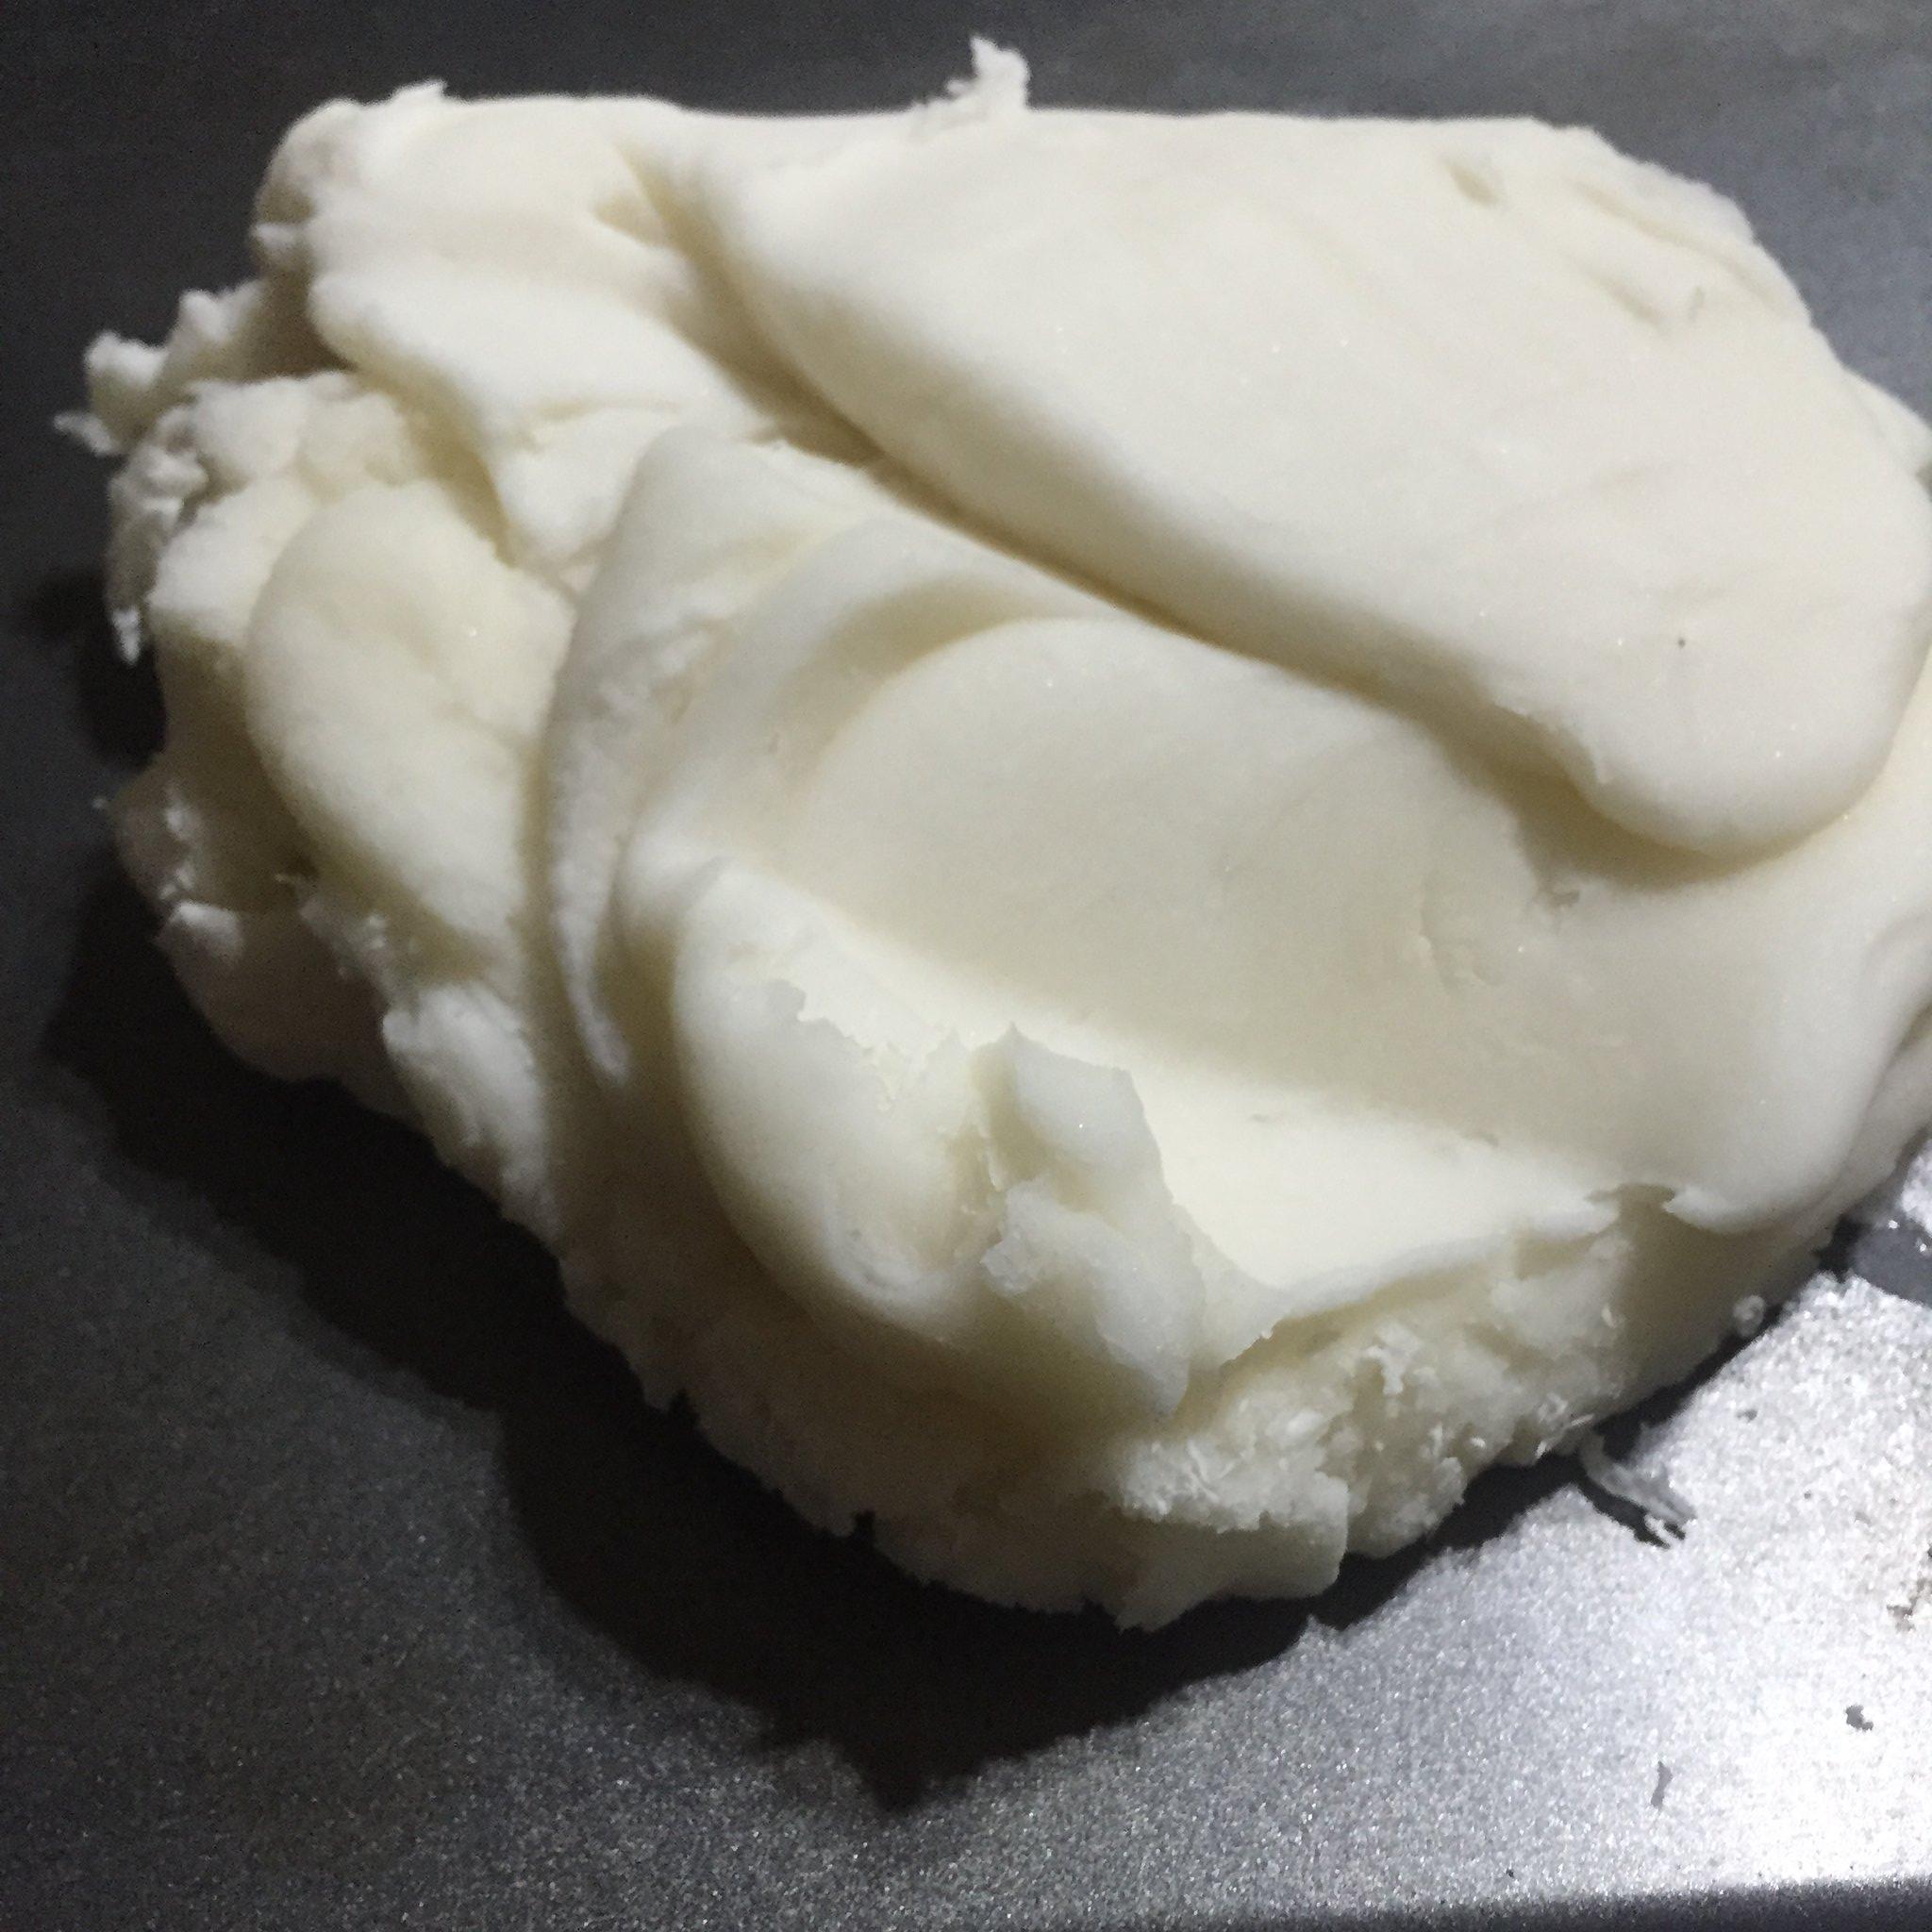 Freshly-made hot playdough